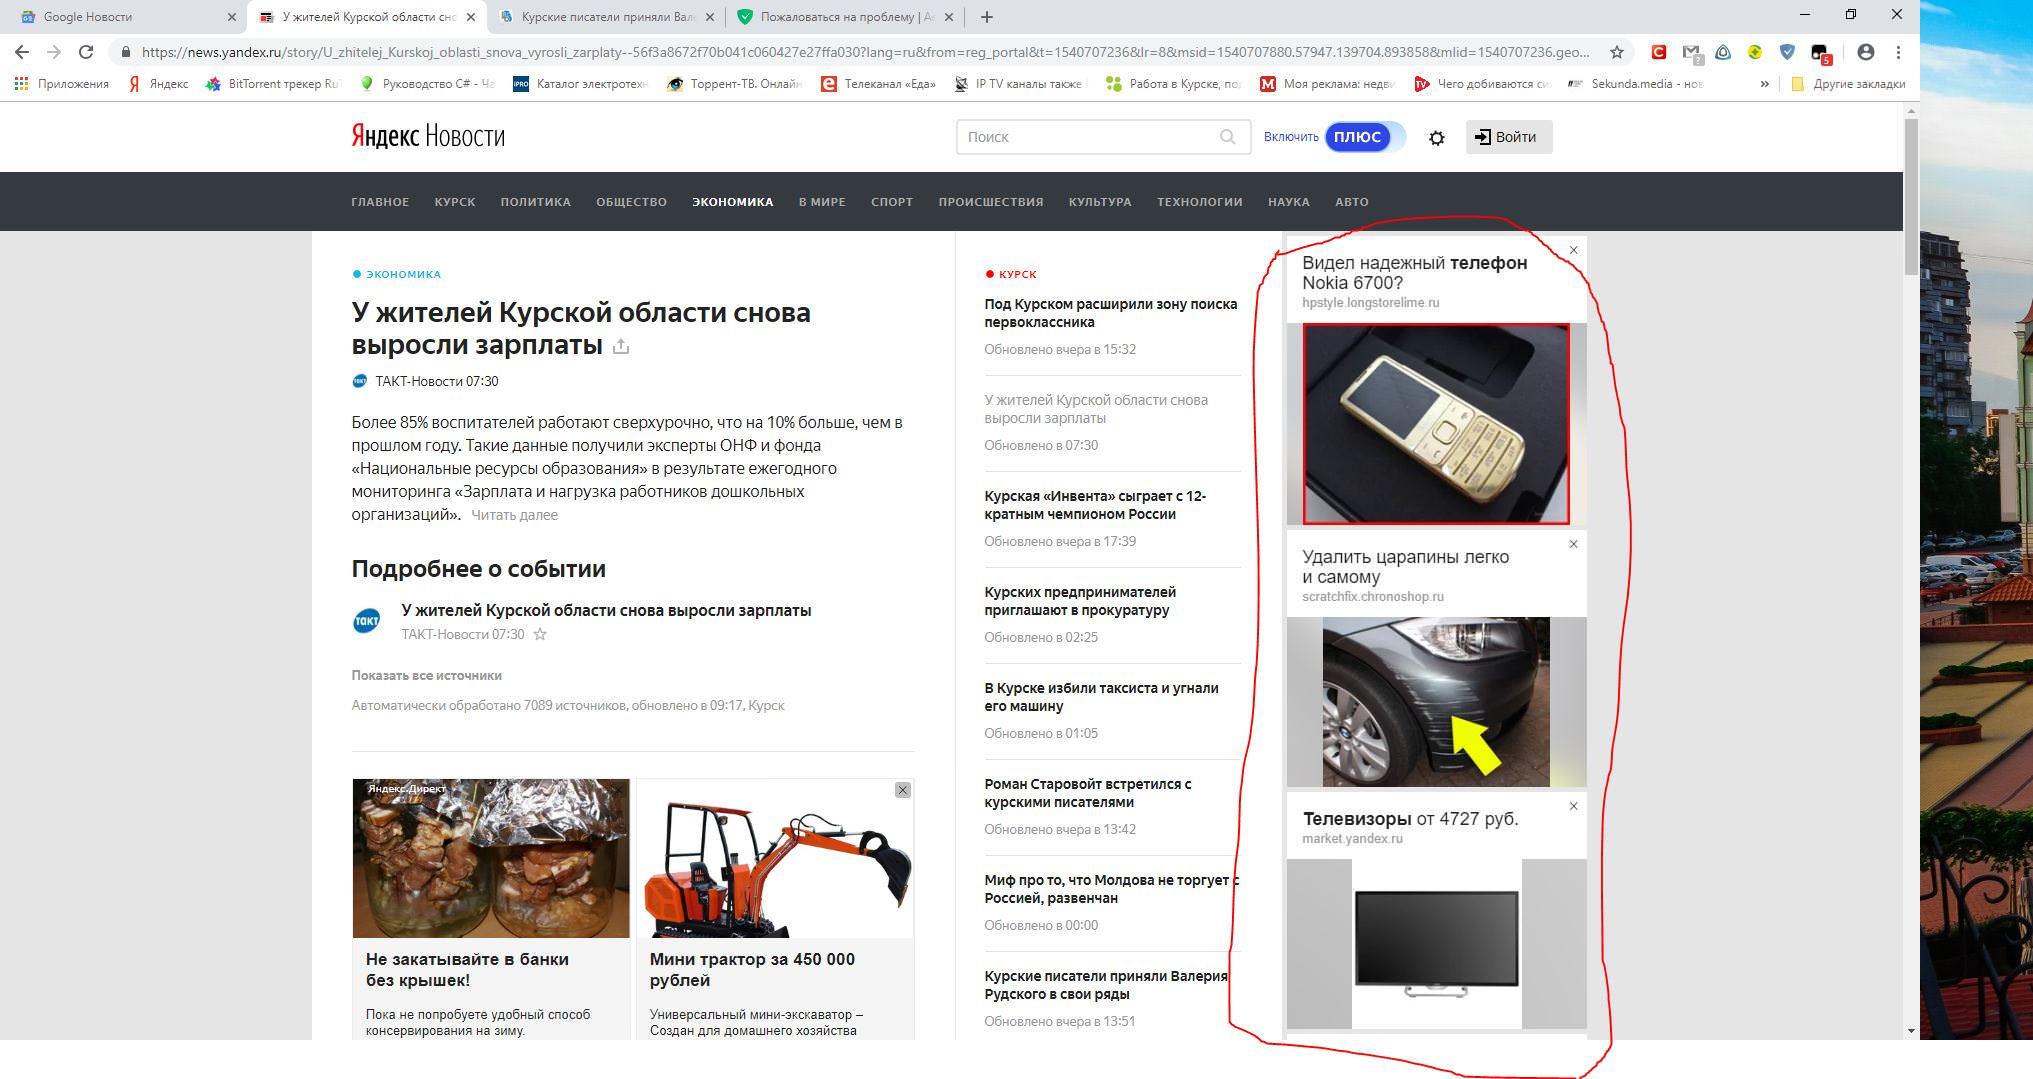 news yandex ru · Issue #24175 · AdguardTeam/AdguardFilters